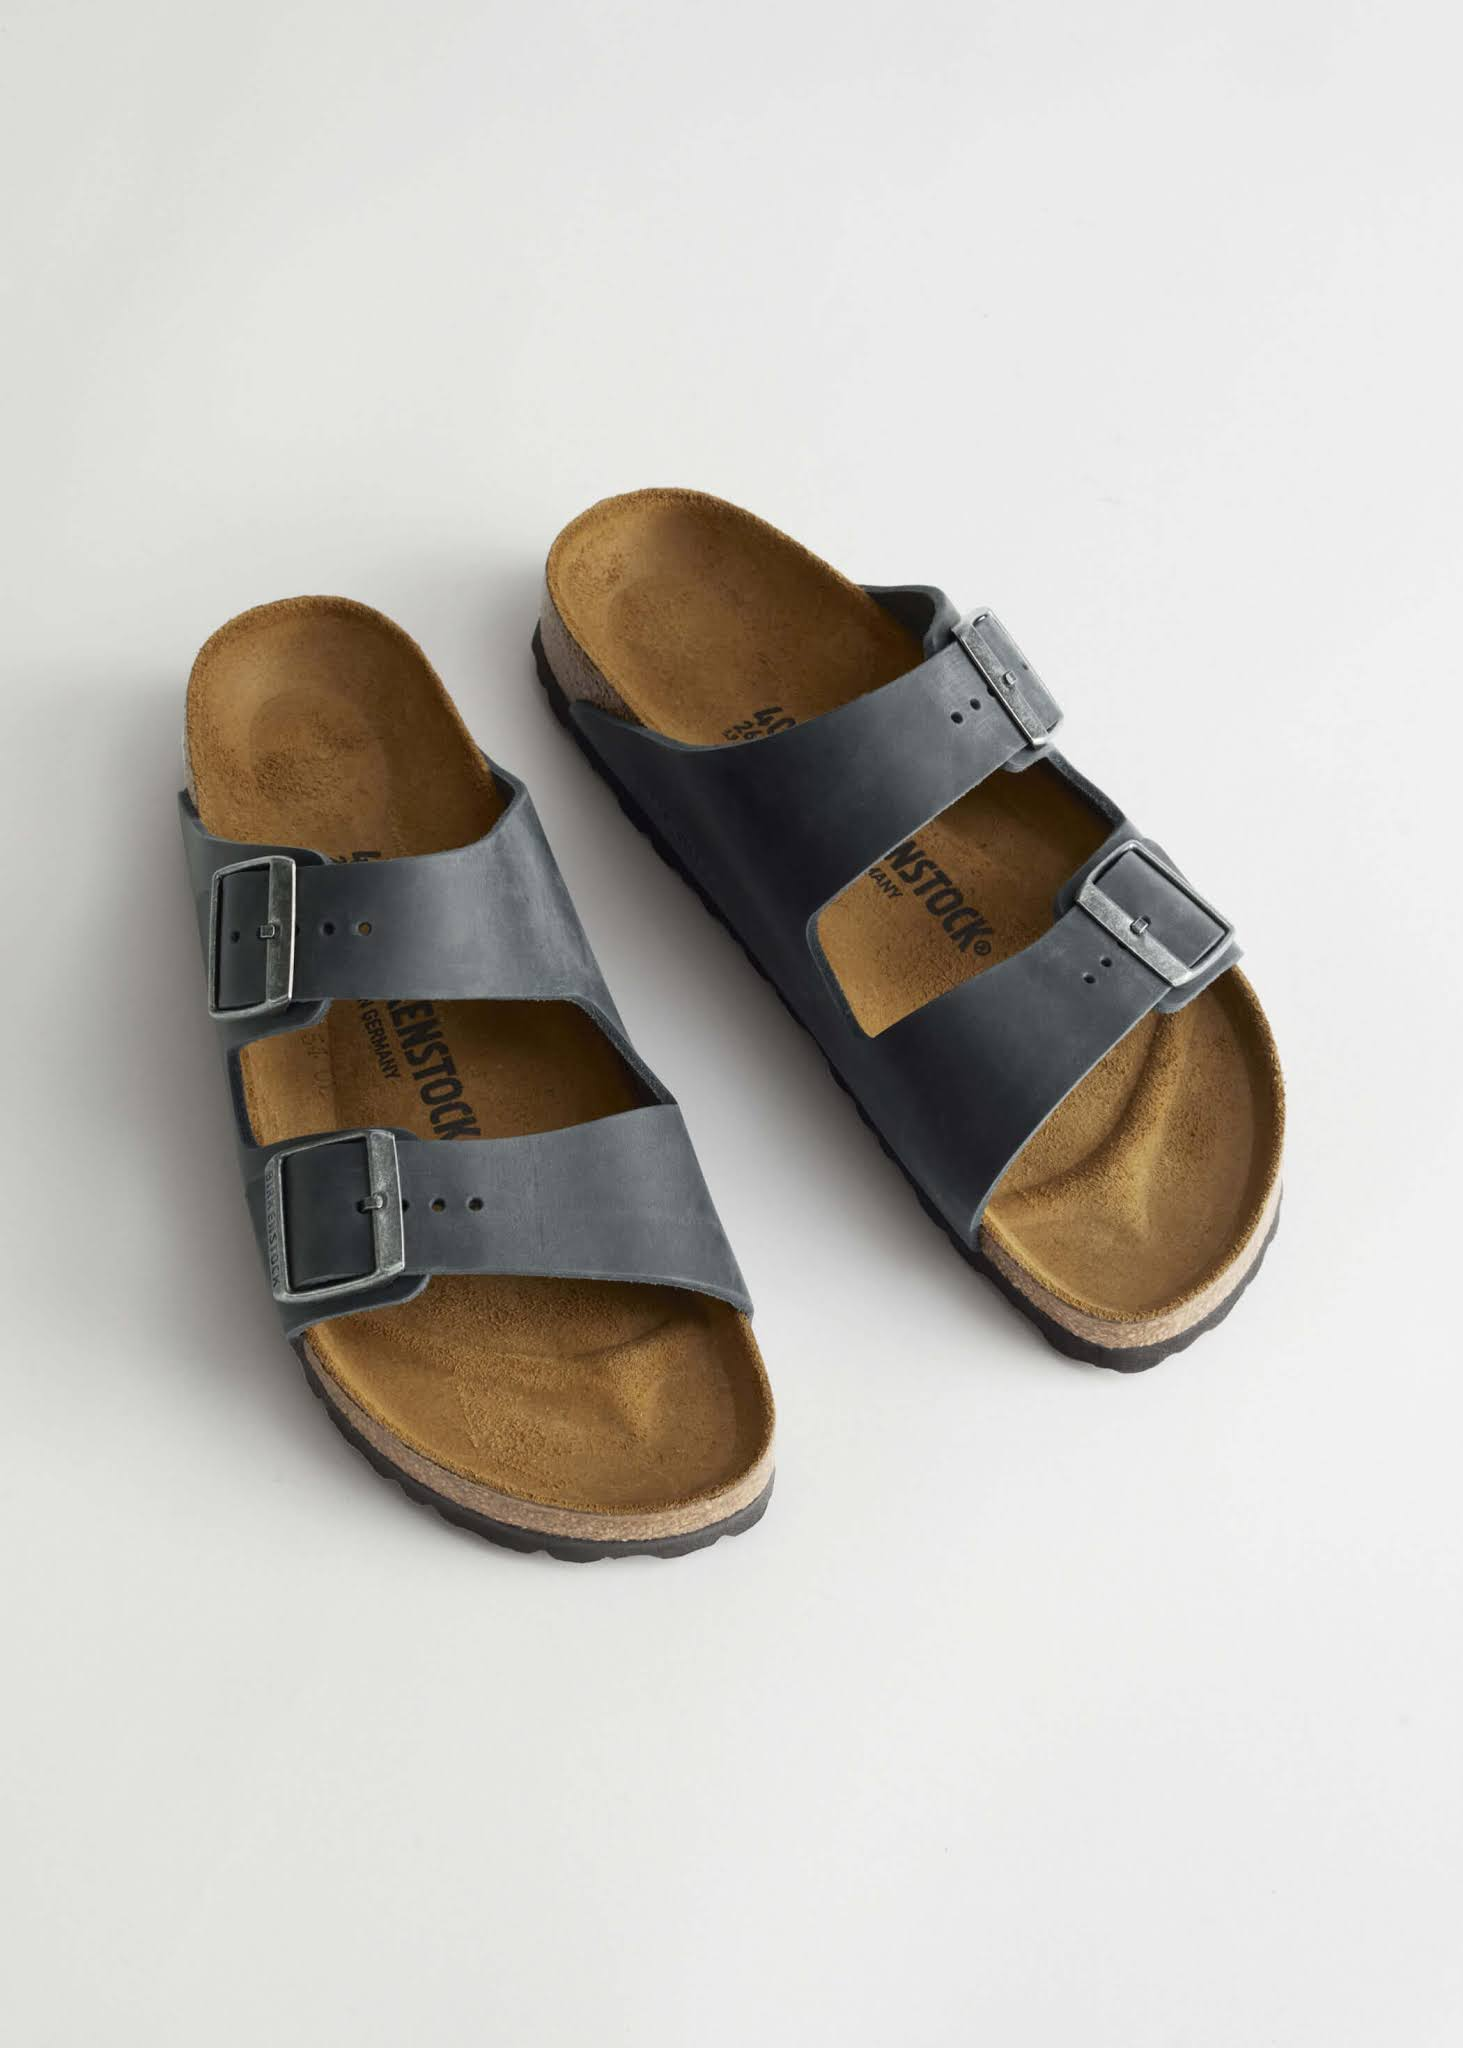 arizona oiled leather sandals